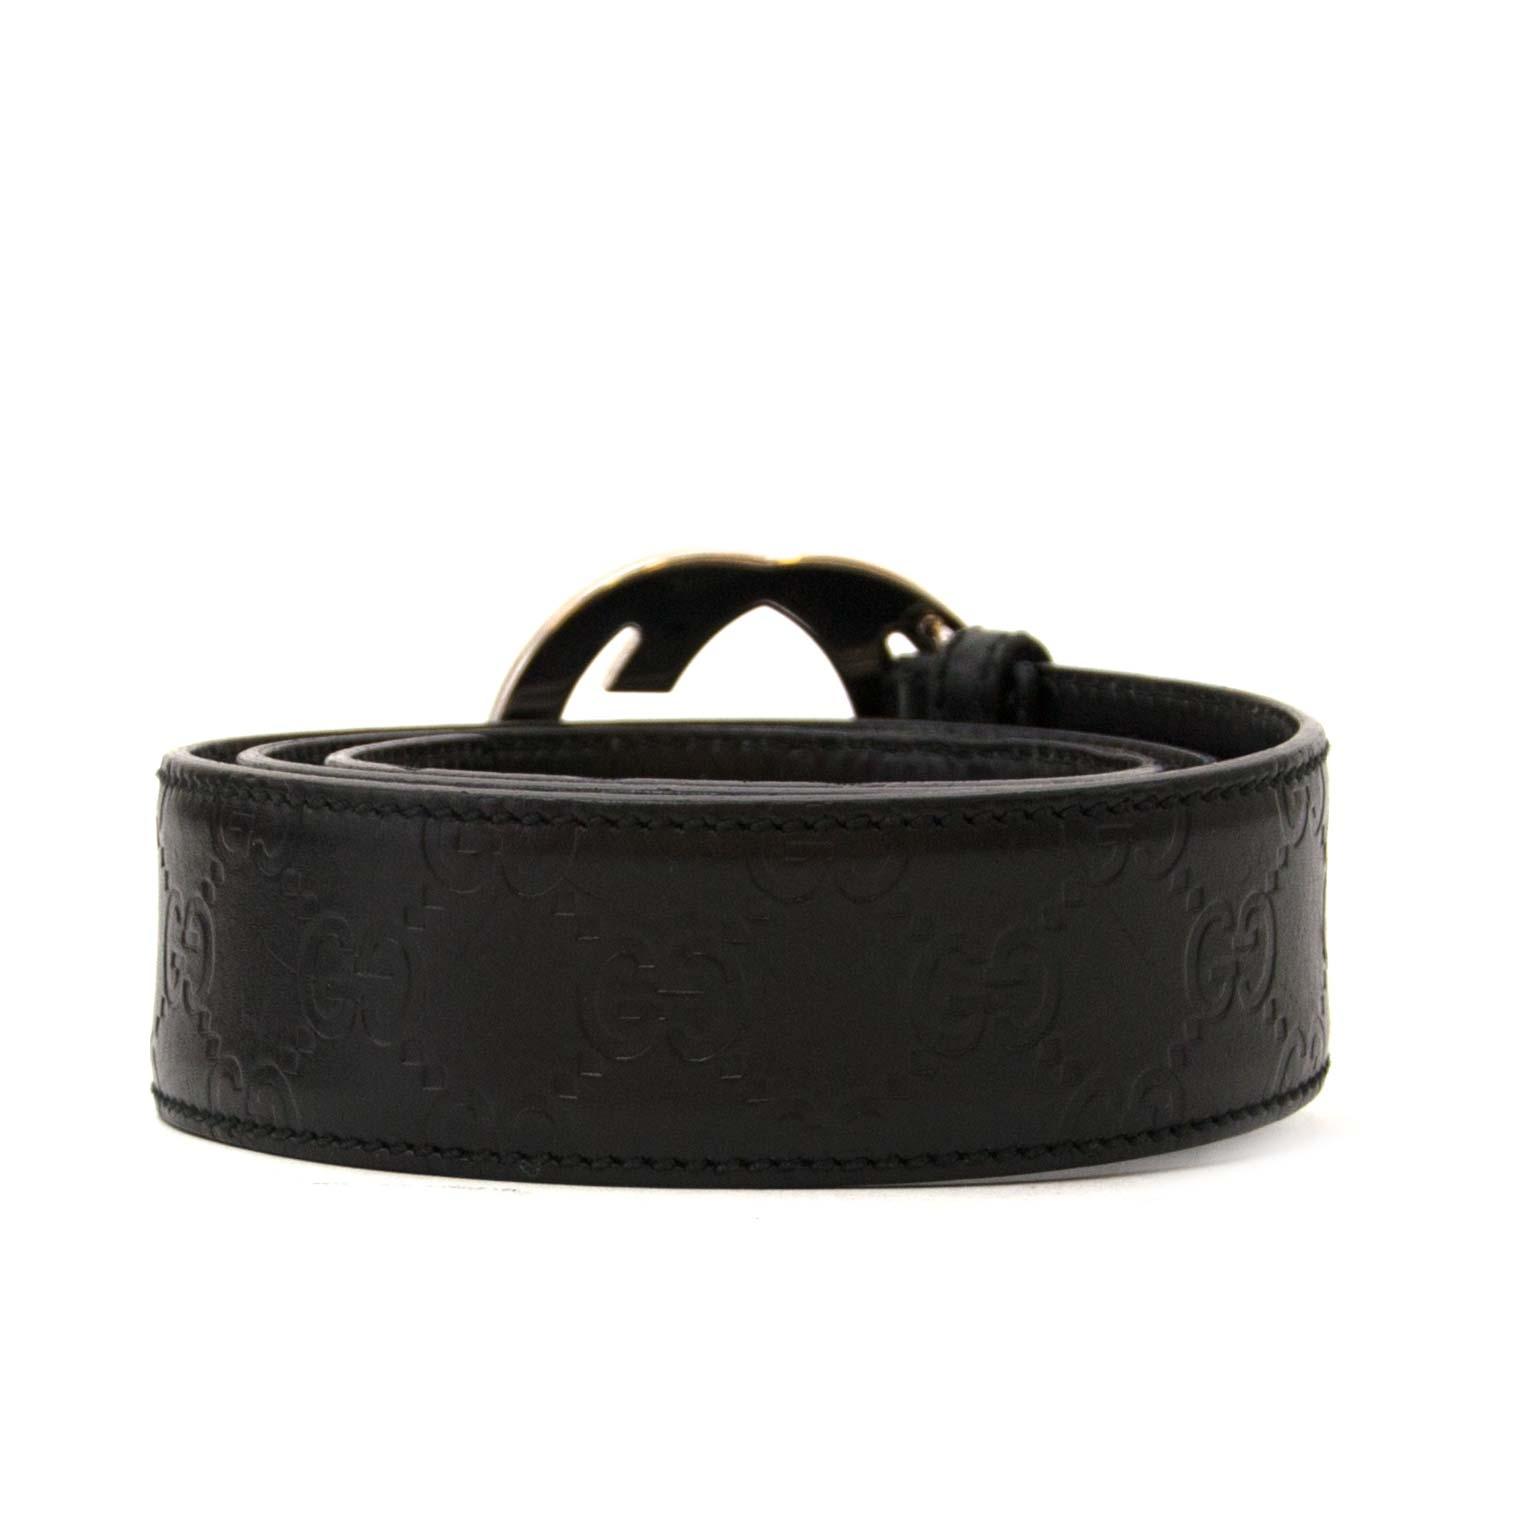 cea41008708 ... belt now for sale online at labellov vintage fashion webshop belgium  gucci black interlocking g riem nu te koop bij labellov vintage mode  webshop belgië